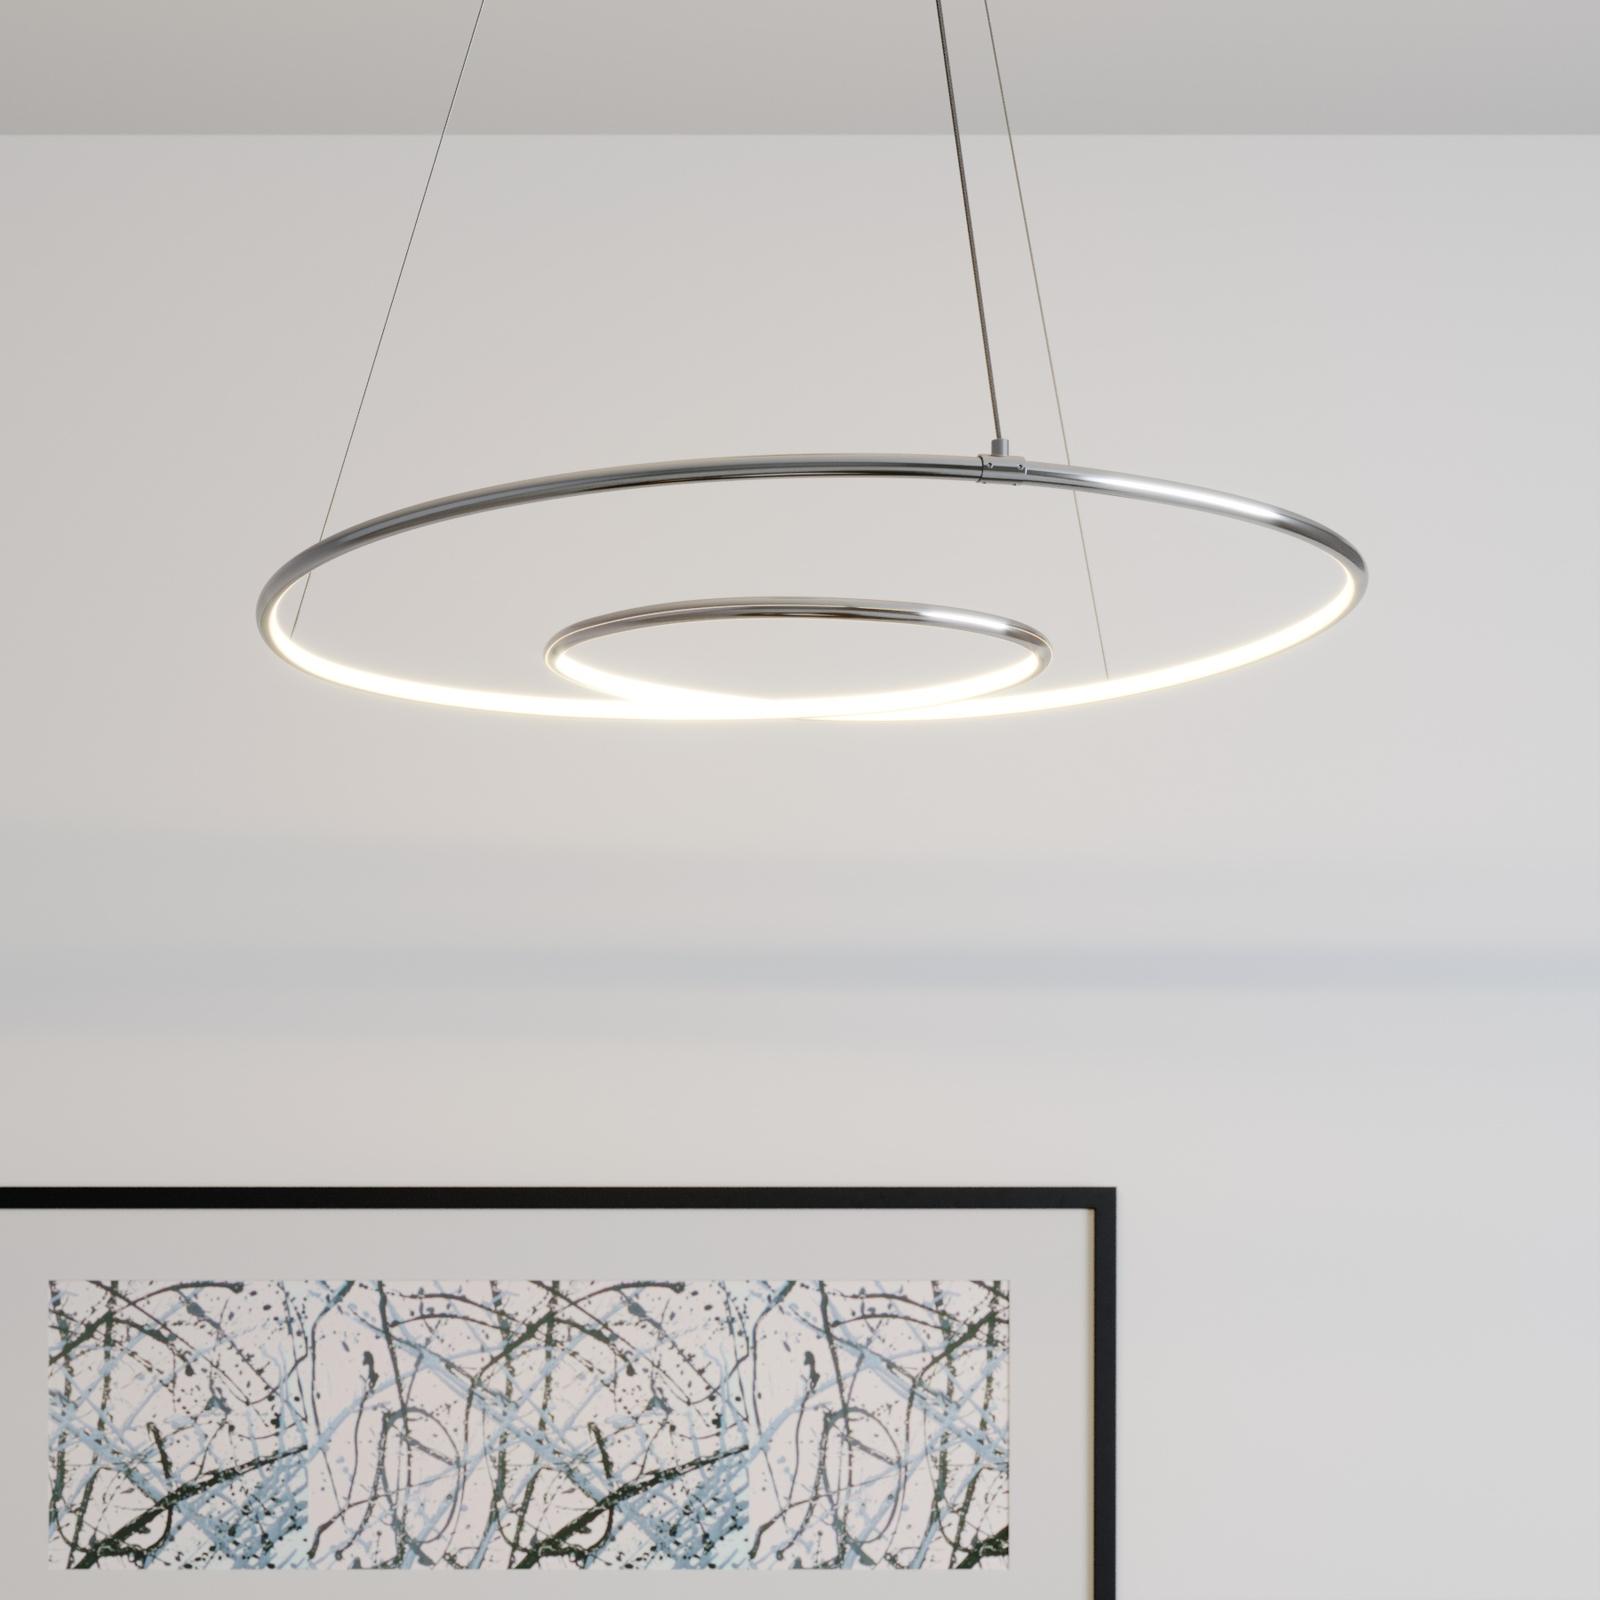 Lindby Lucy LED-Hängeleuchte, 70cm, chrom